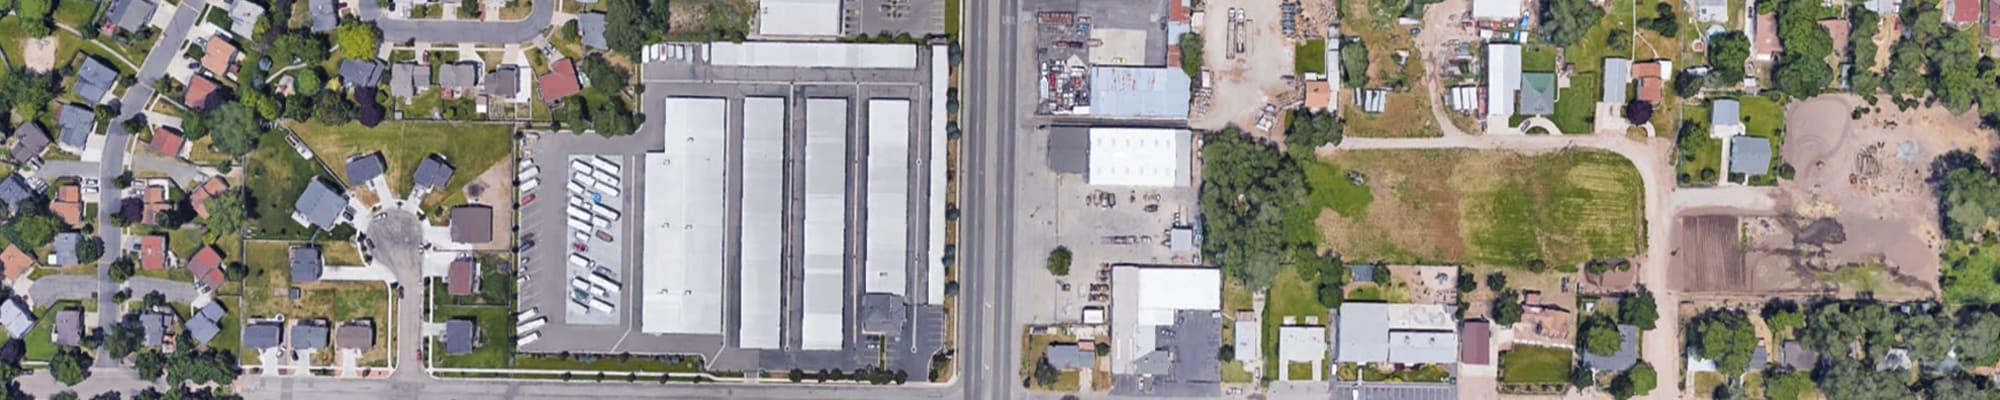 Our self storage locations at Lock It Up Self Storage in Ogden, Utah